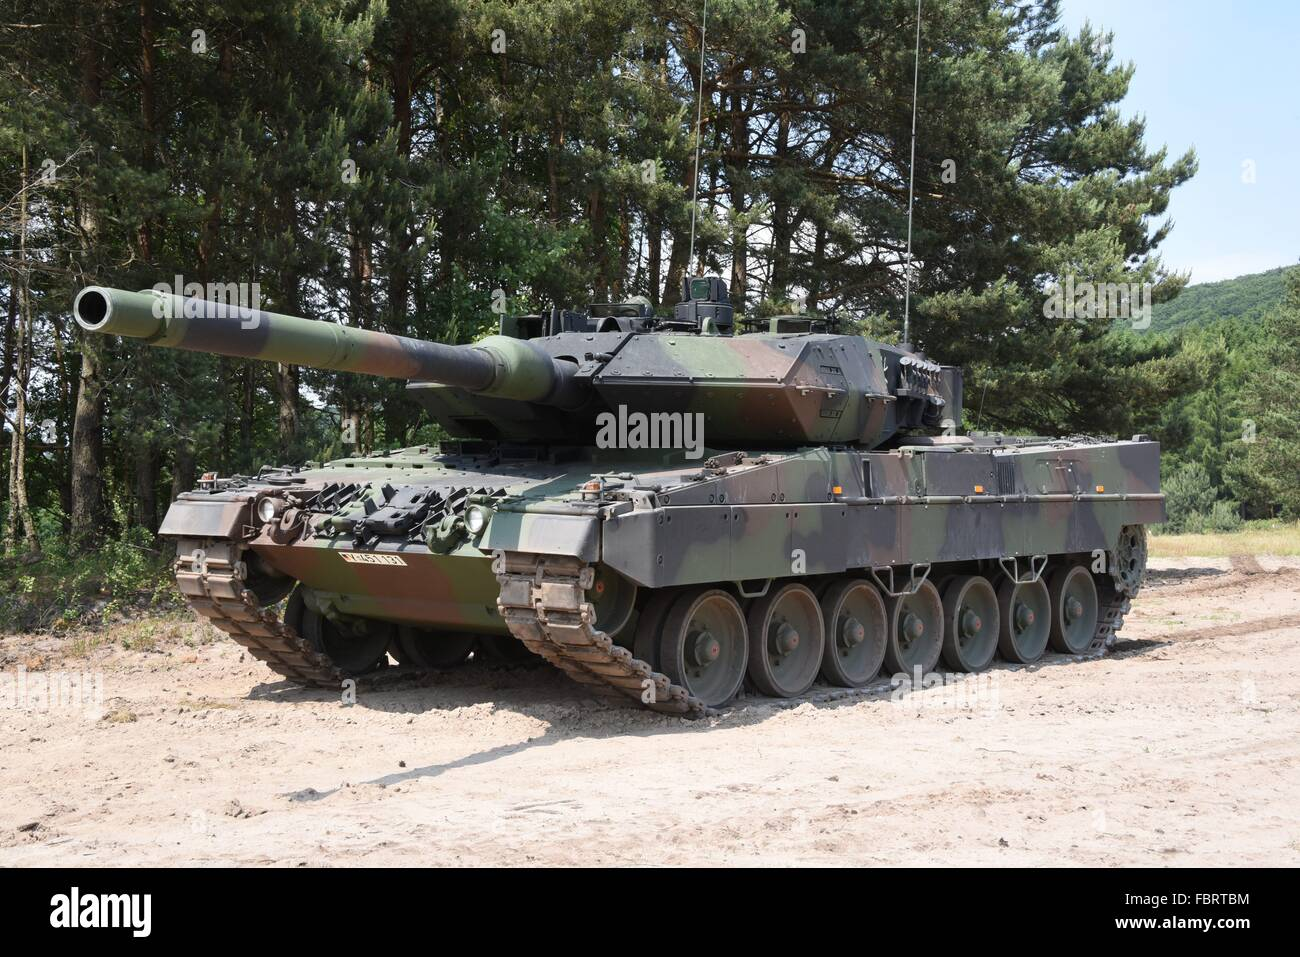 leopard 2a7 main battle tank der 2 kompanie 203 panzer. Black Bedroom Furniture Sets. Home Design Ideas